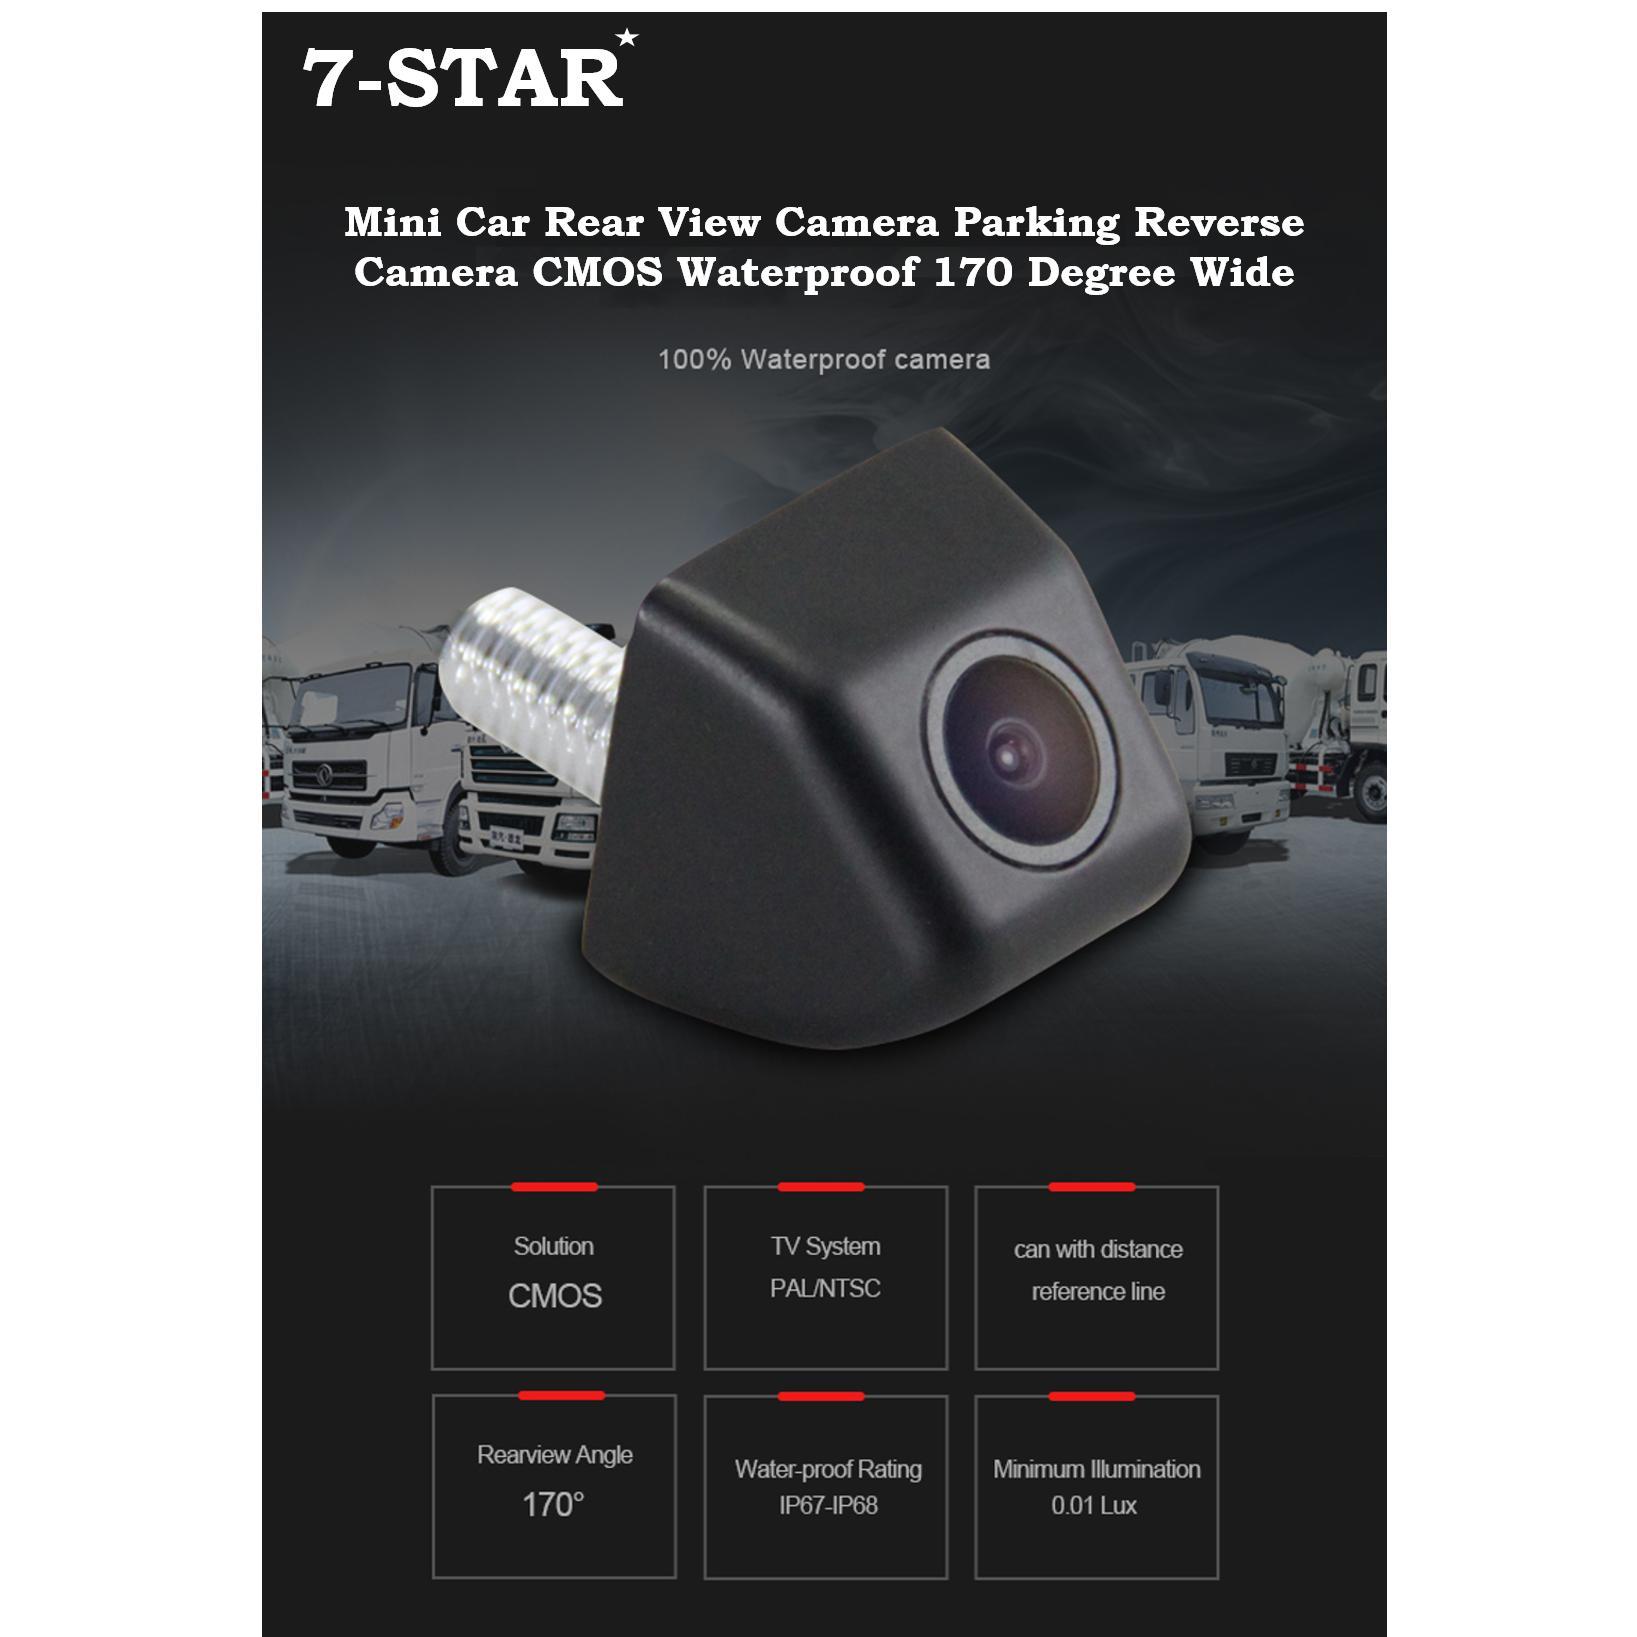 Mini Car Rear View Camera Parking Reverse Camera CMOS Waterproof 170 Degree Wide